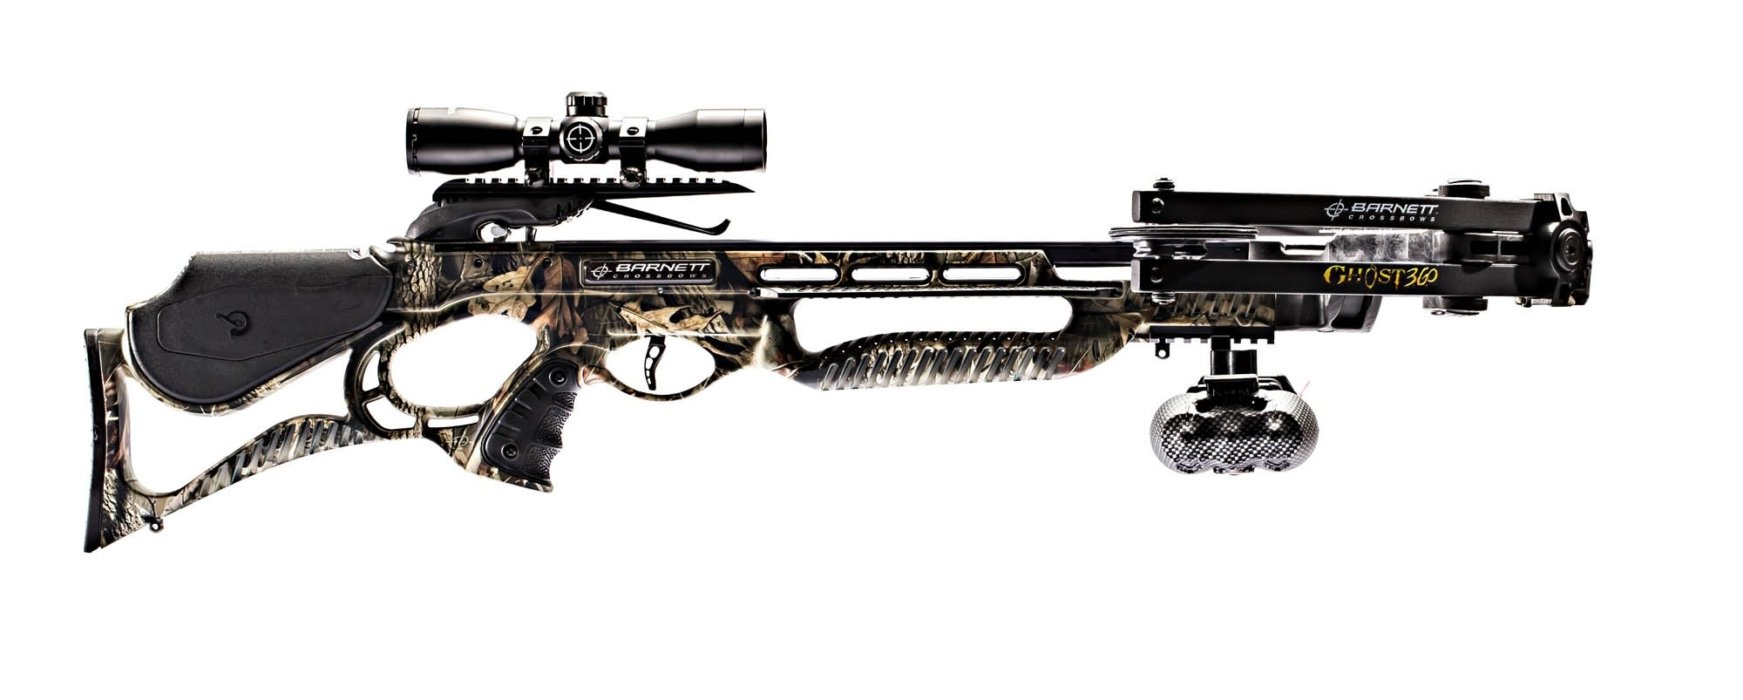 A product shot of a Barnett crossbow